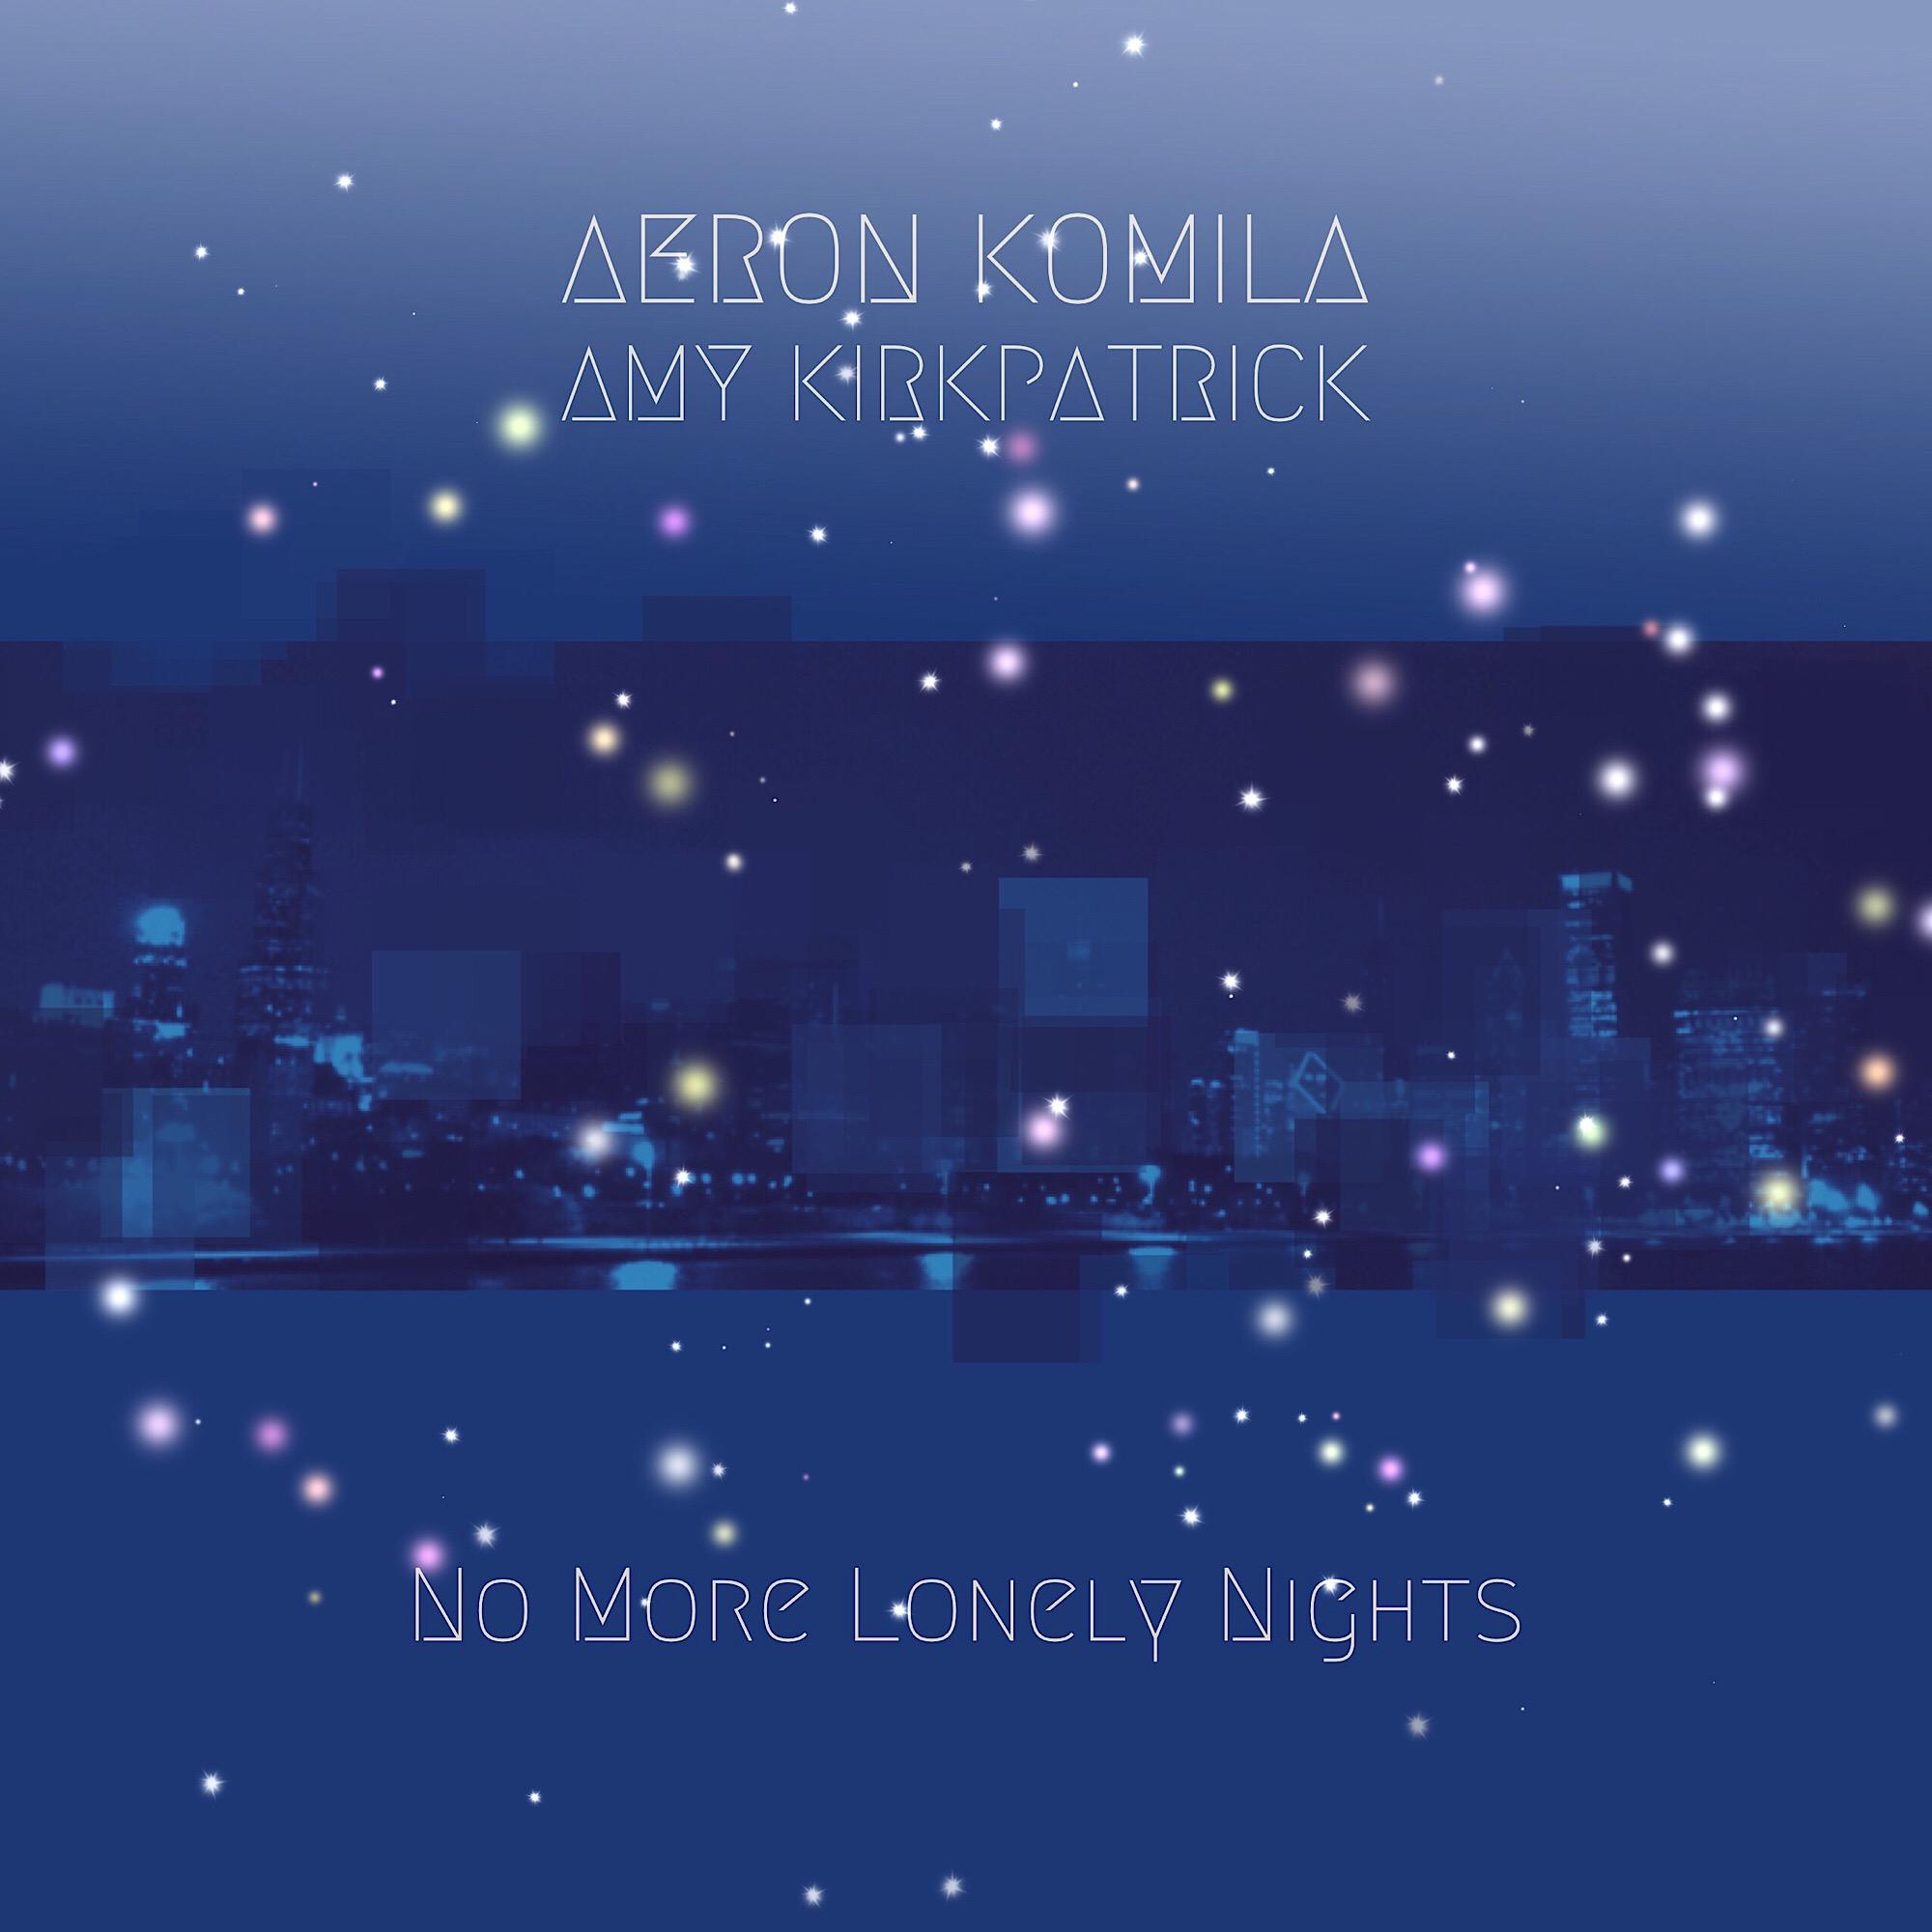 Aeron Komila - No More Lonely Nights (Radio Edit)